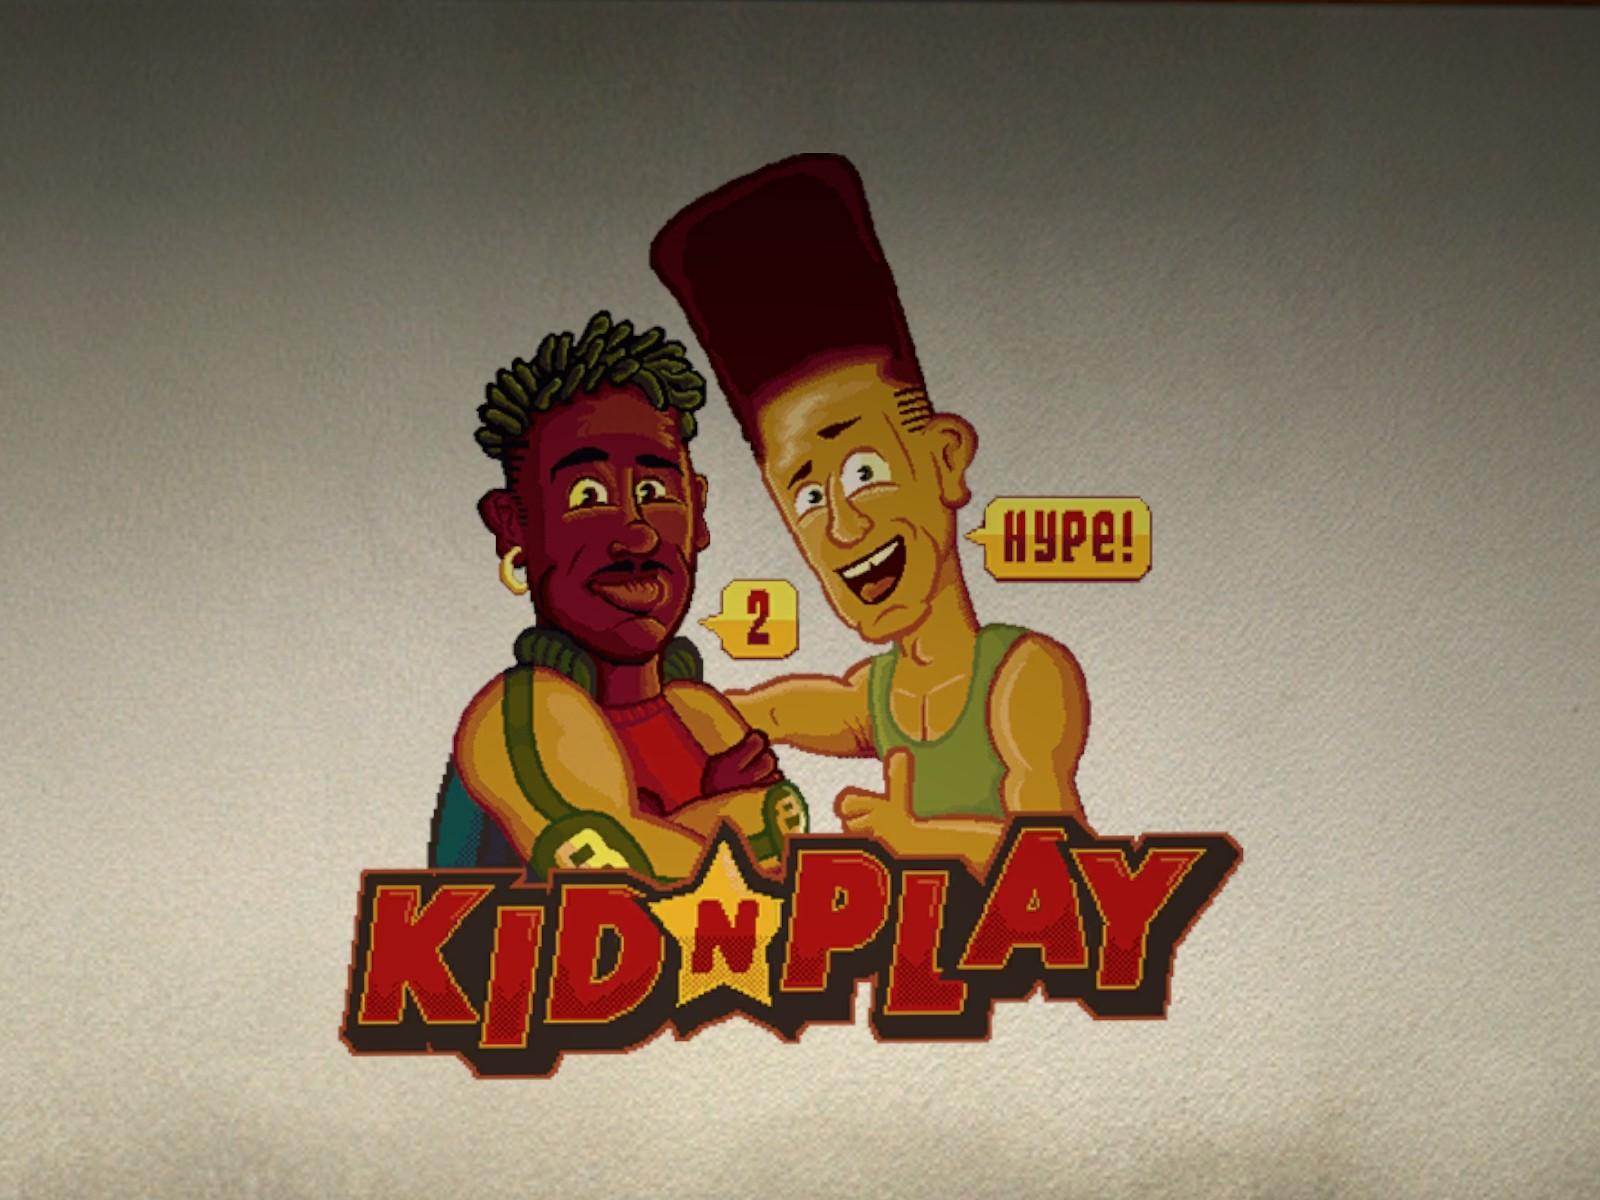 8 Bit Kid N Play Counter Strike Source Gt Sprays Gt Music